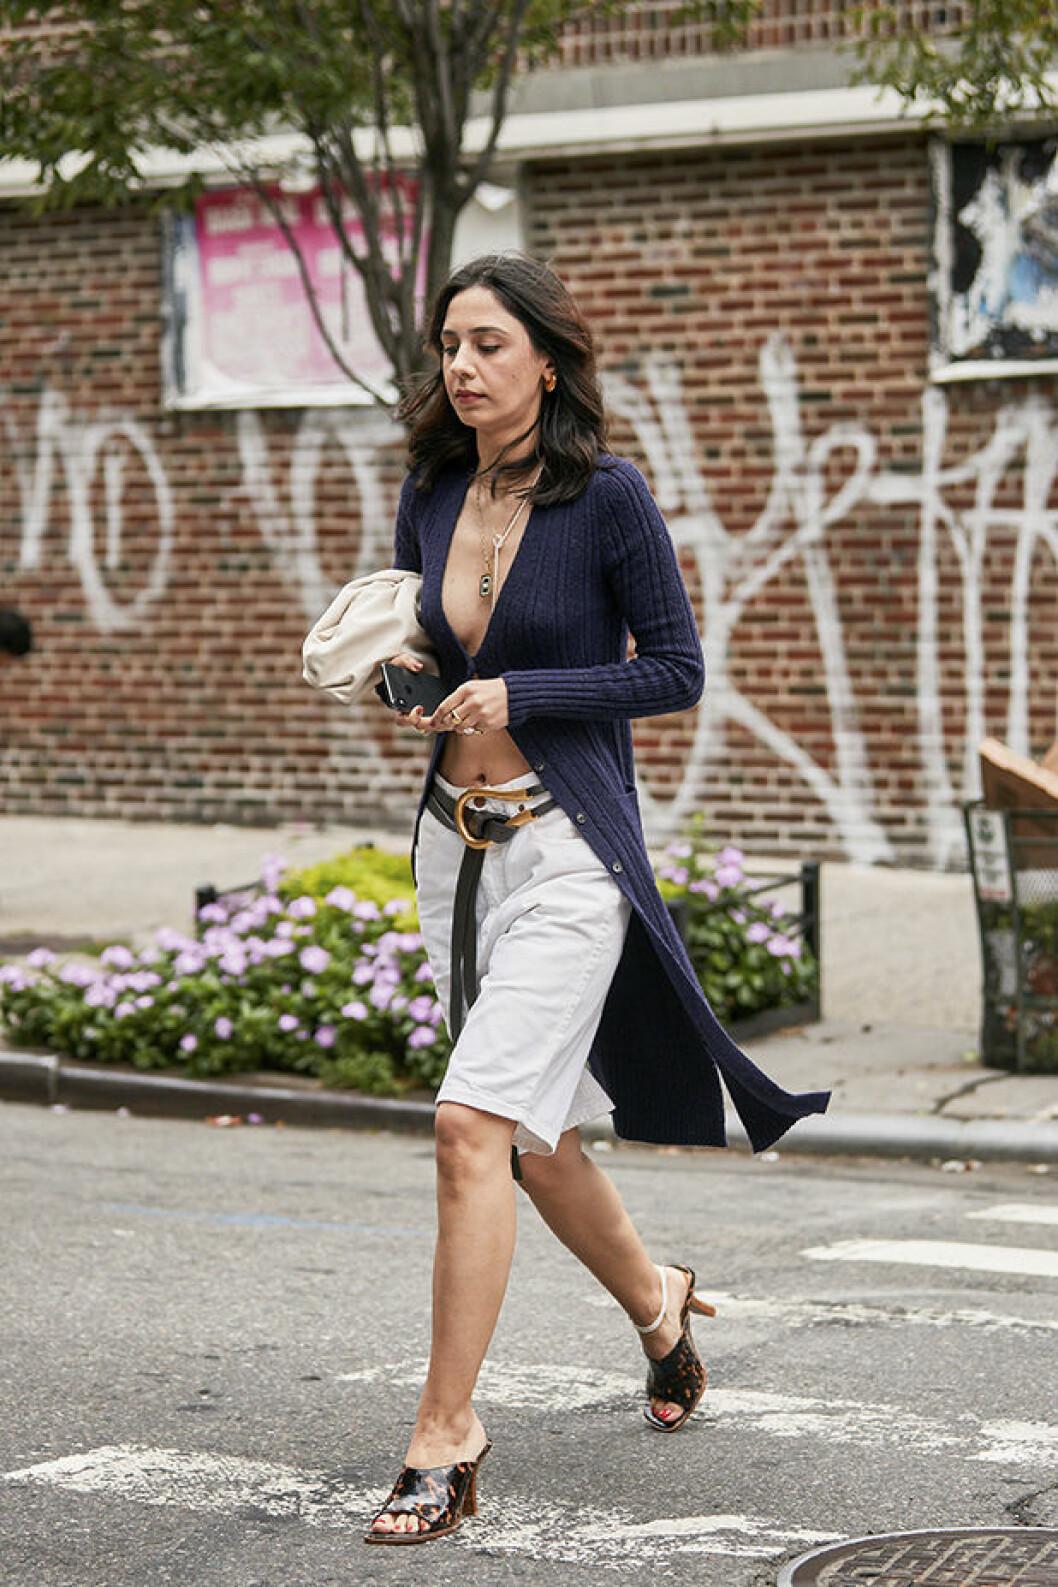 Streetstyleinspiration från modeveckan i New York.